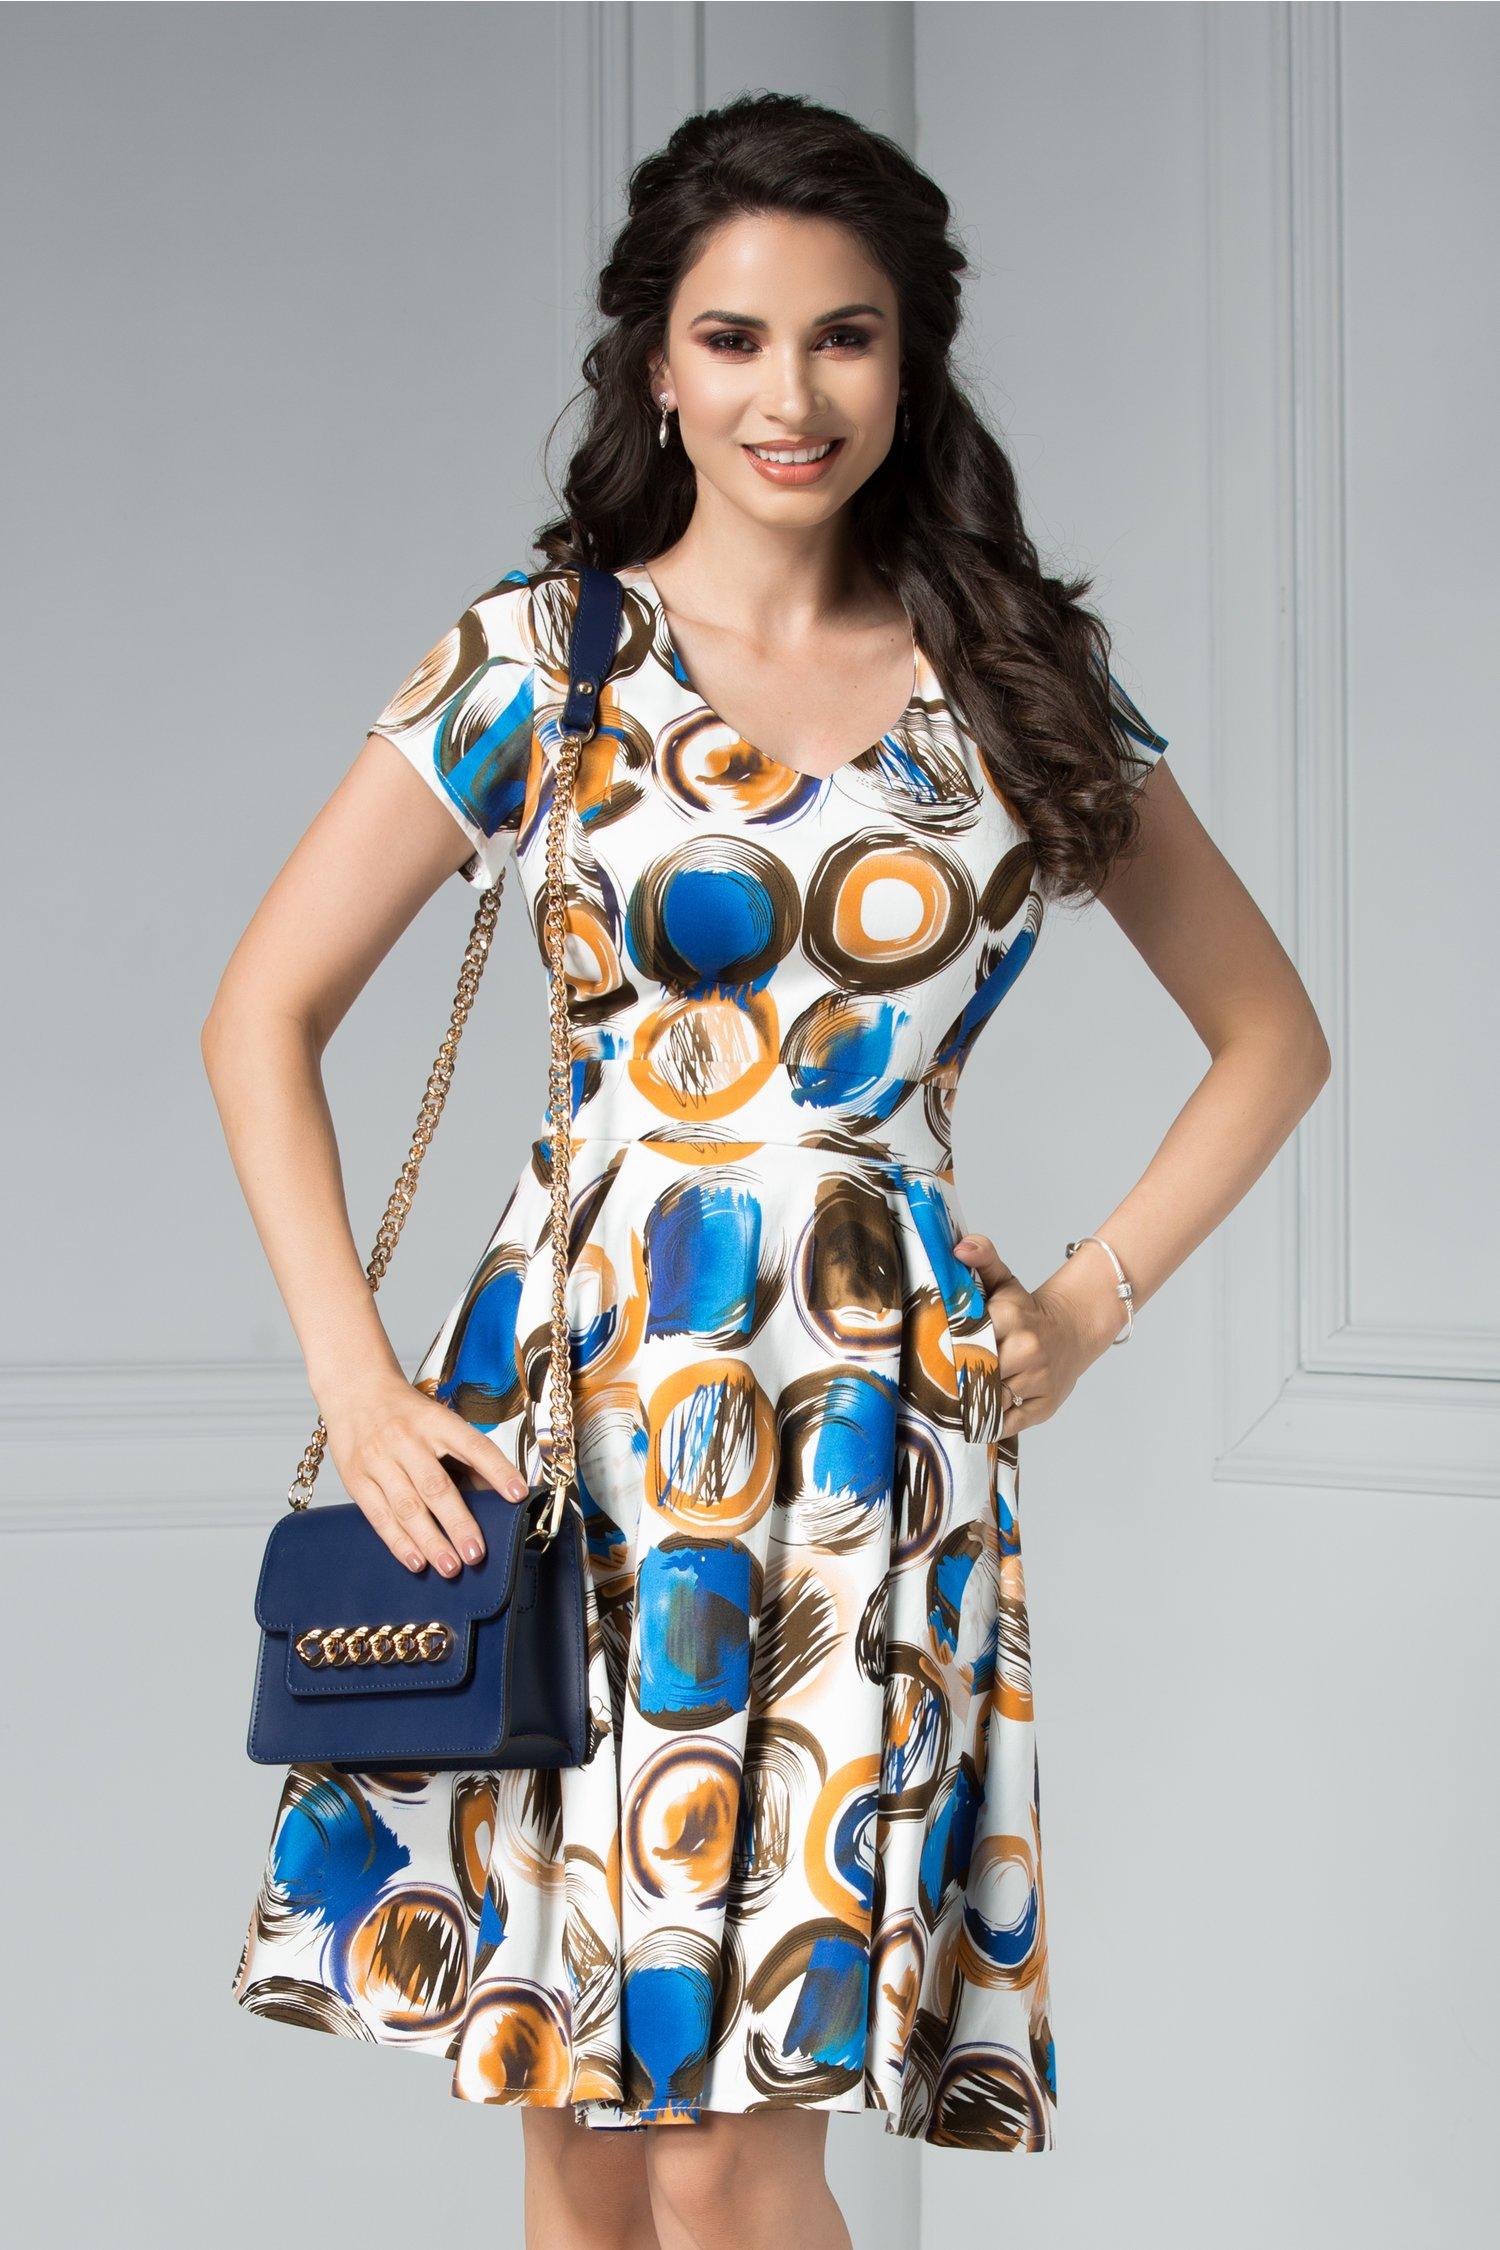 Rochie Reeva alba scurta cu imprimeu colorat deosebit